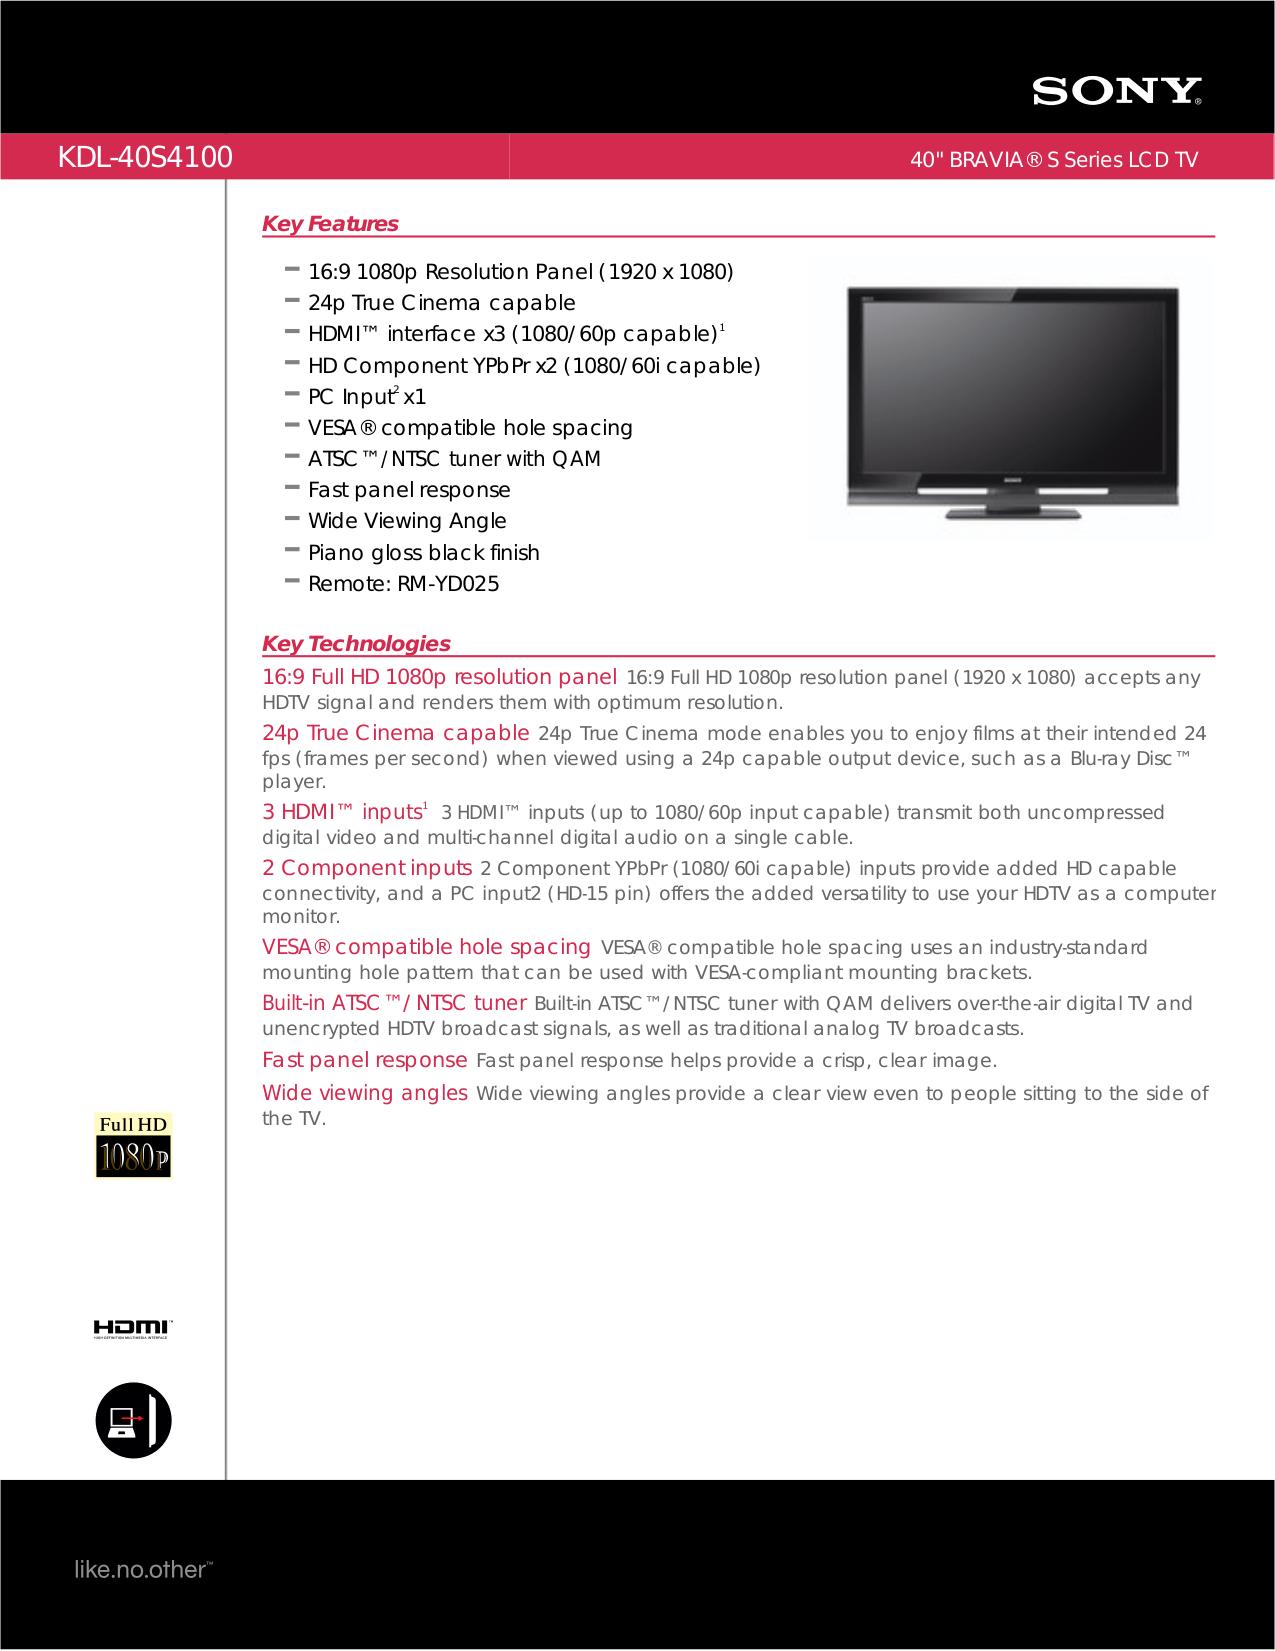 download free pdf for sony bravia kdl 40s4100 tv manual rh umlib com Sony KDL 42Ex440 sony bravia 40s4100 manual